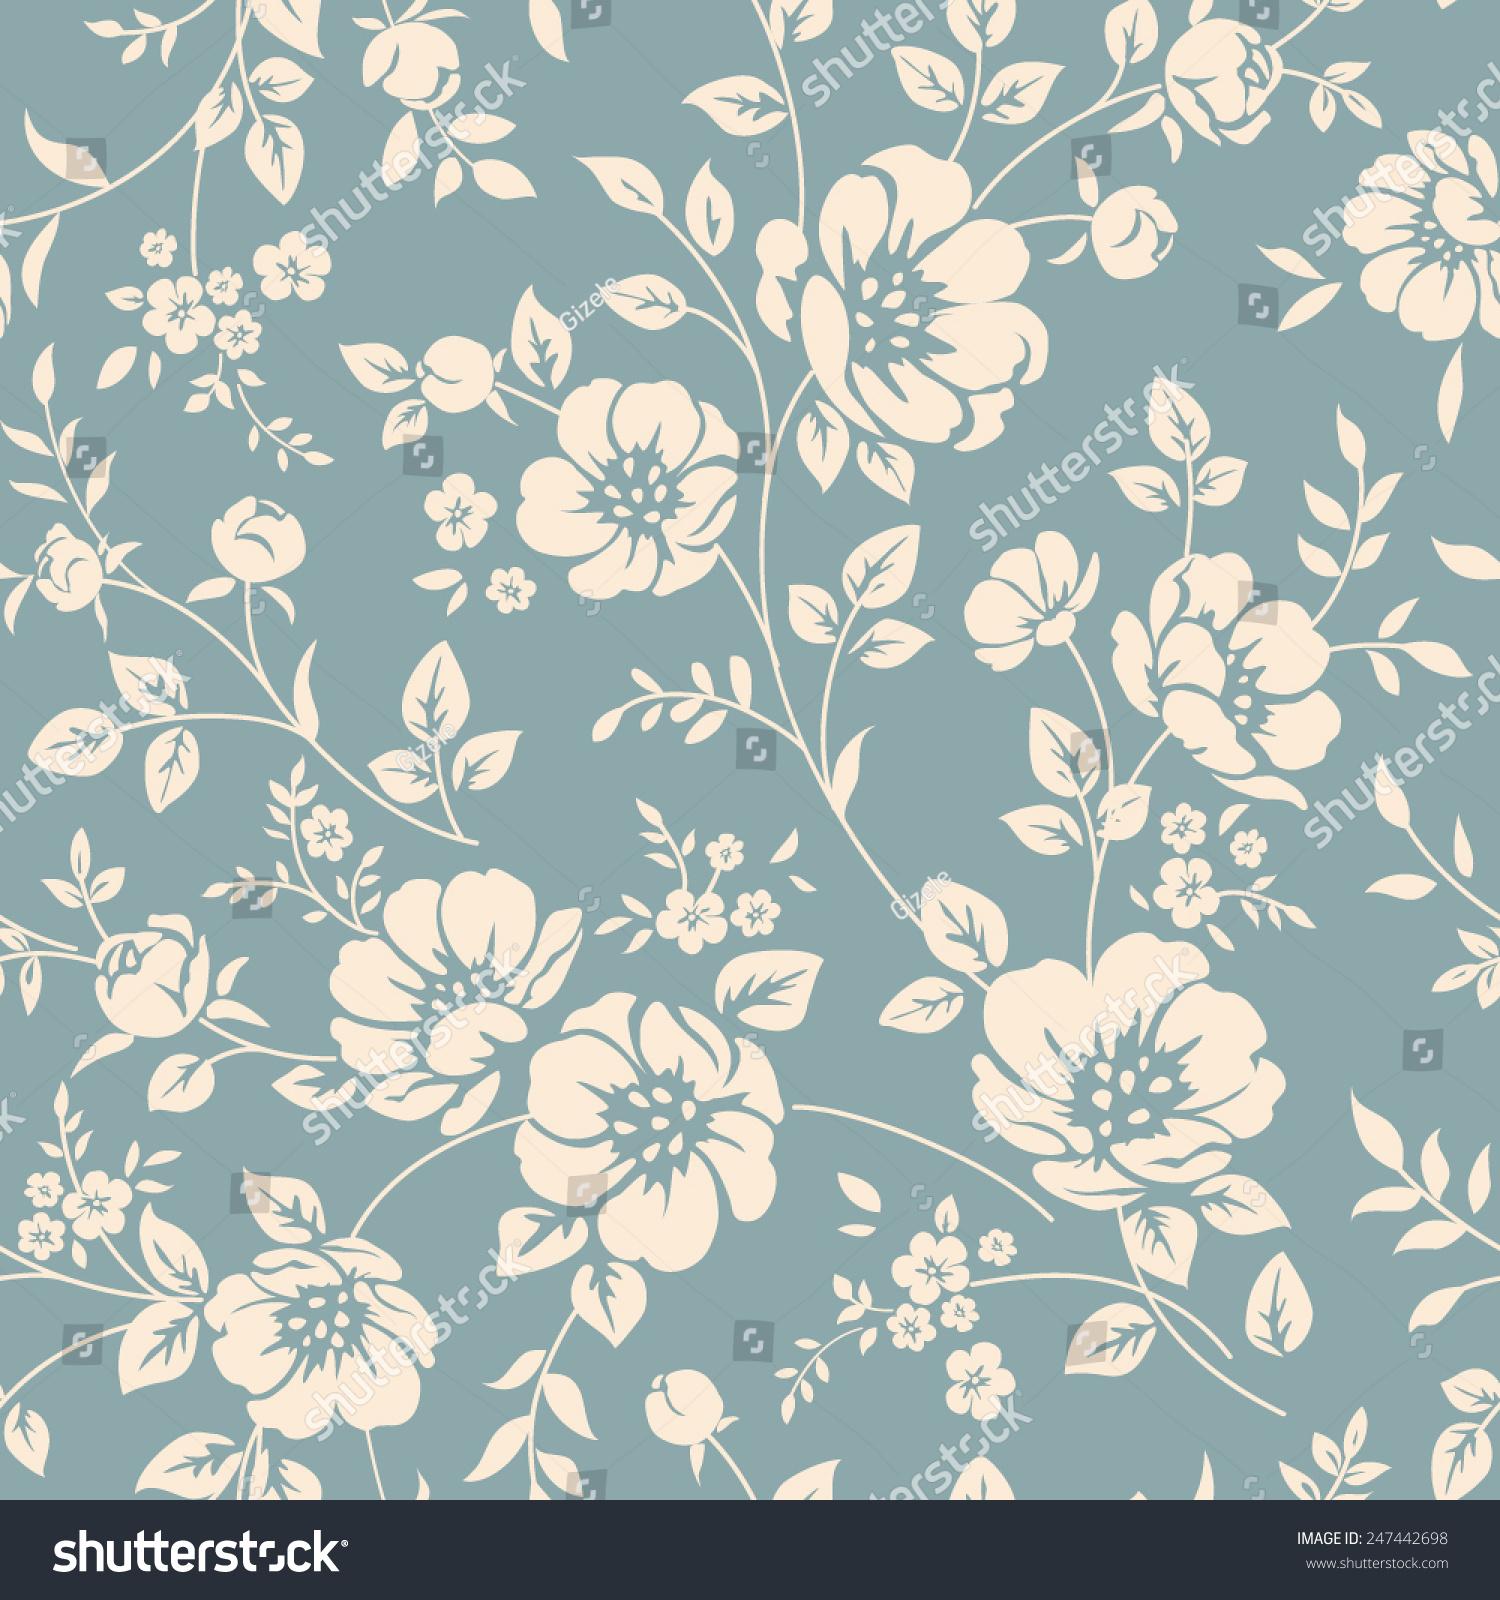 Seamless Vector Floral Wallpaper Decorative Vintage Backgrounds